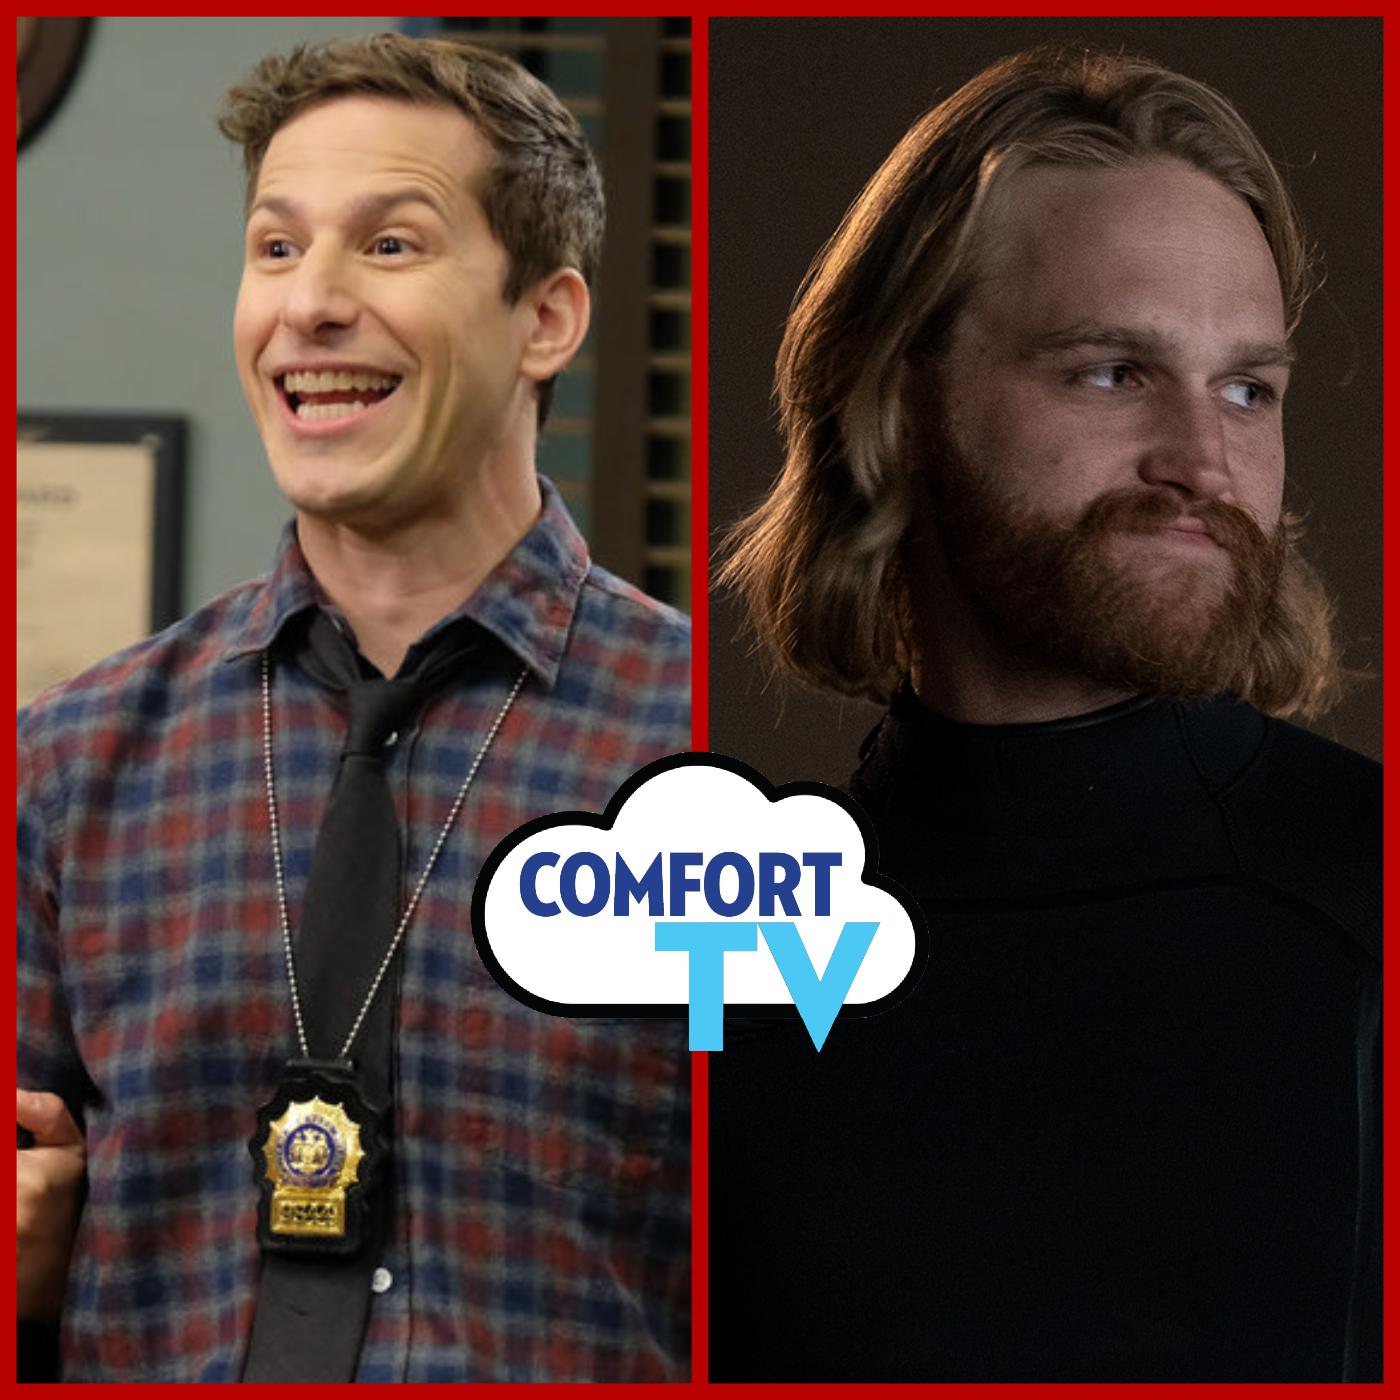 COMFORT TV: Brooklyn Nine-Nine, Lodge 49, and More!